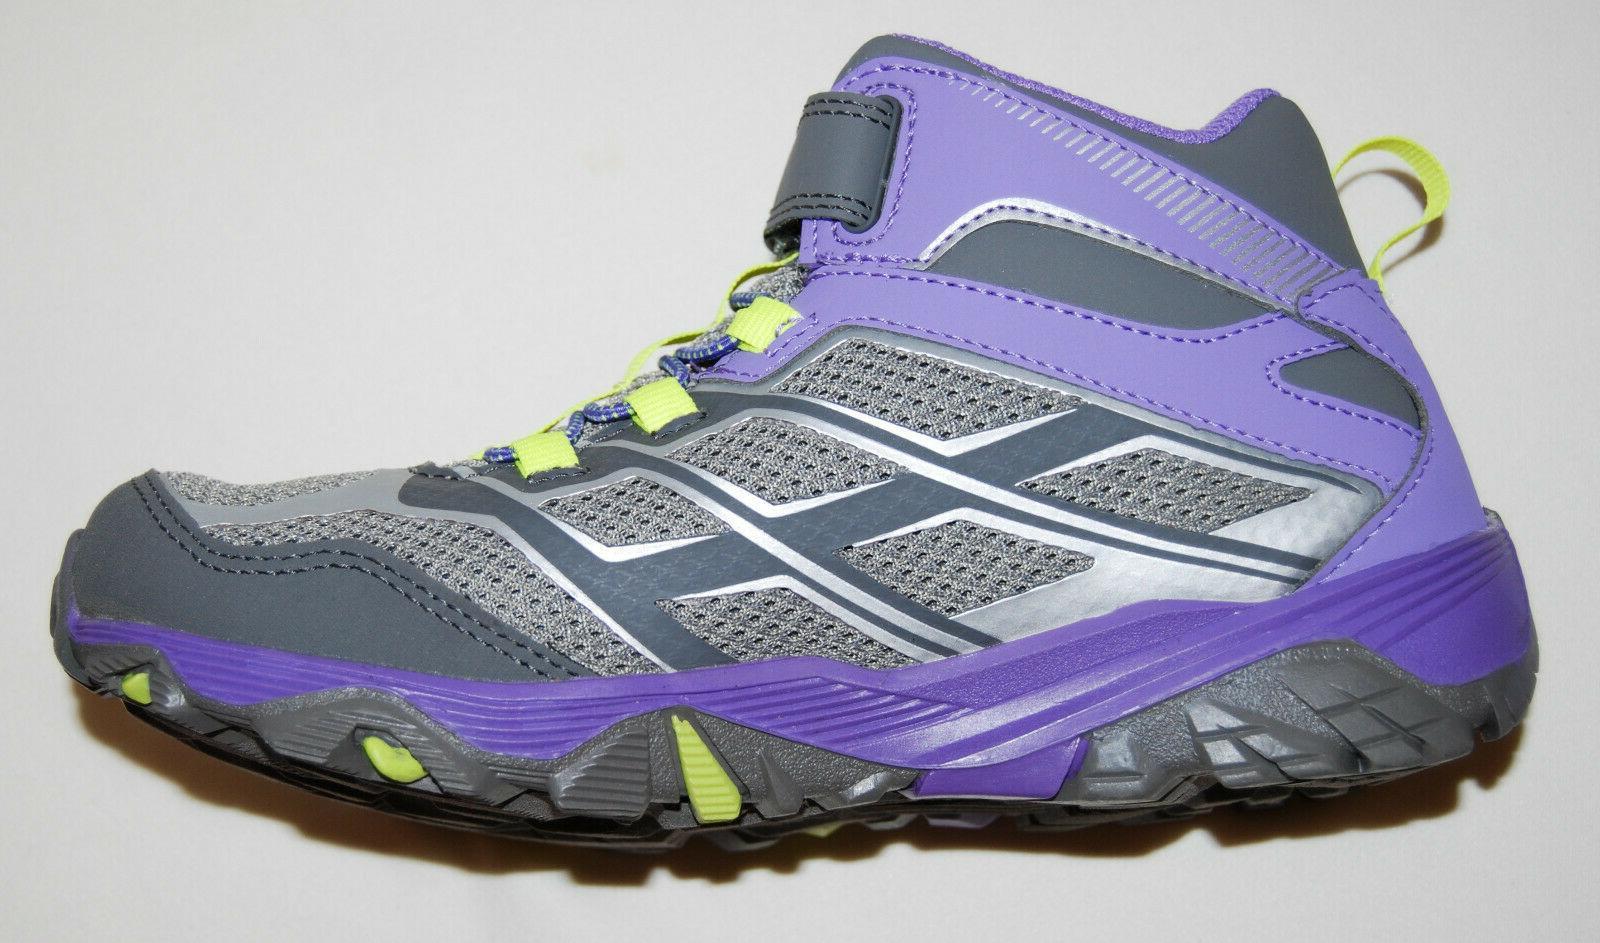 NIB Gray Mid Waterproof Boots sz